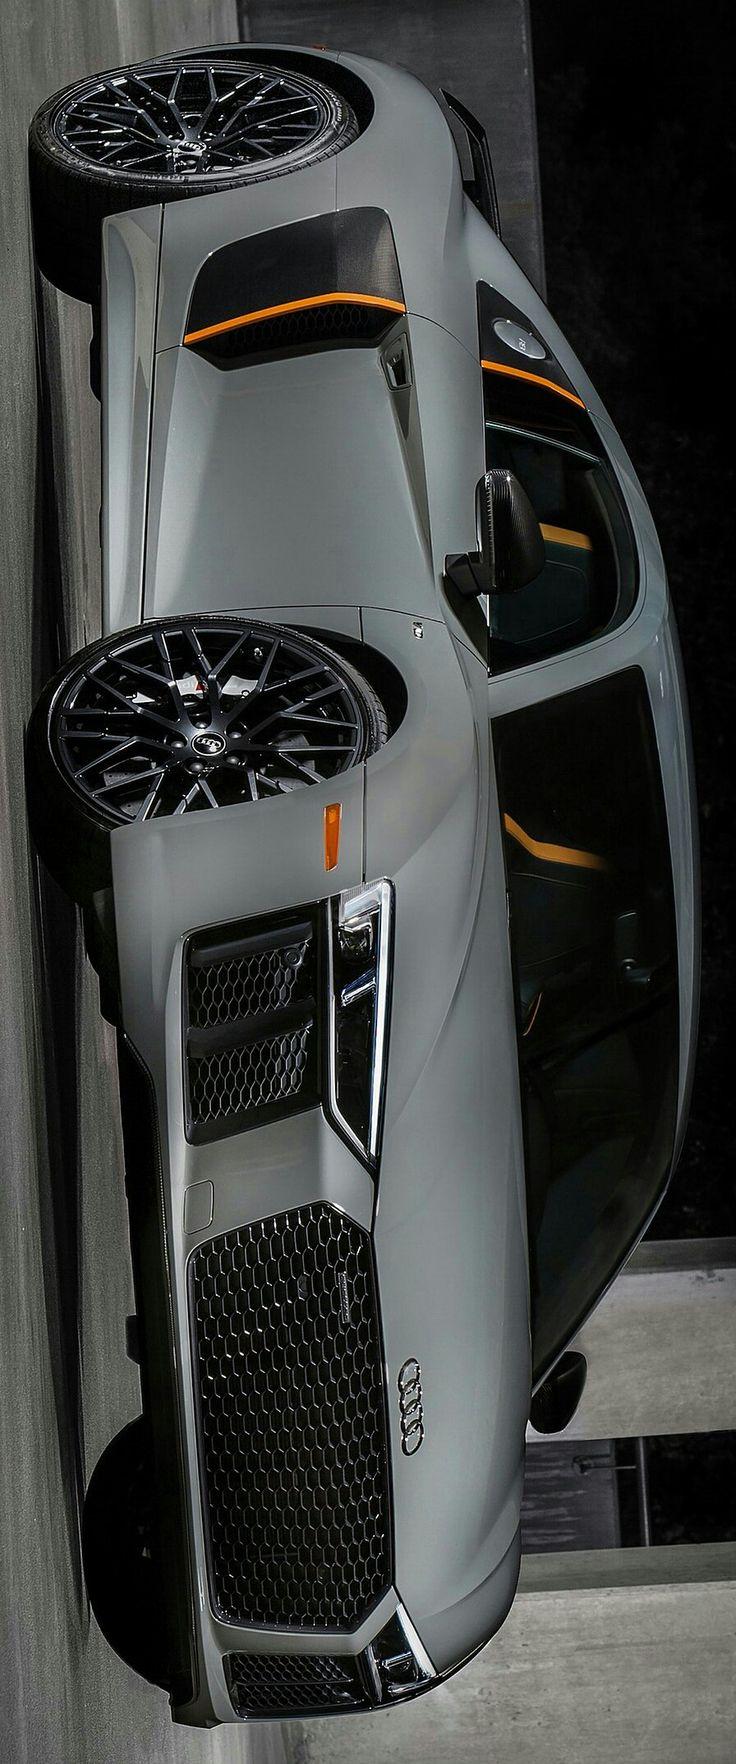 2017 Audi R8 V10 Plus Exclusive Edition $229,200